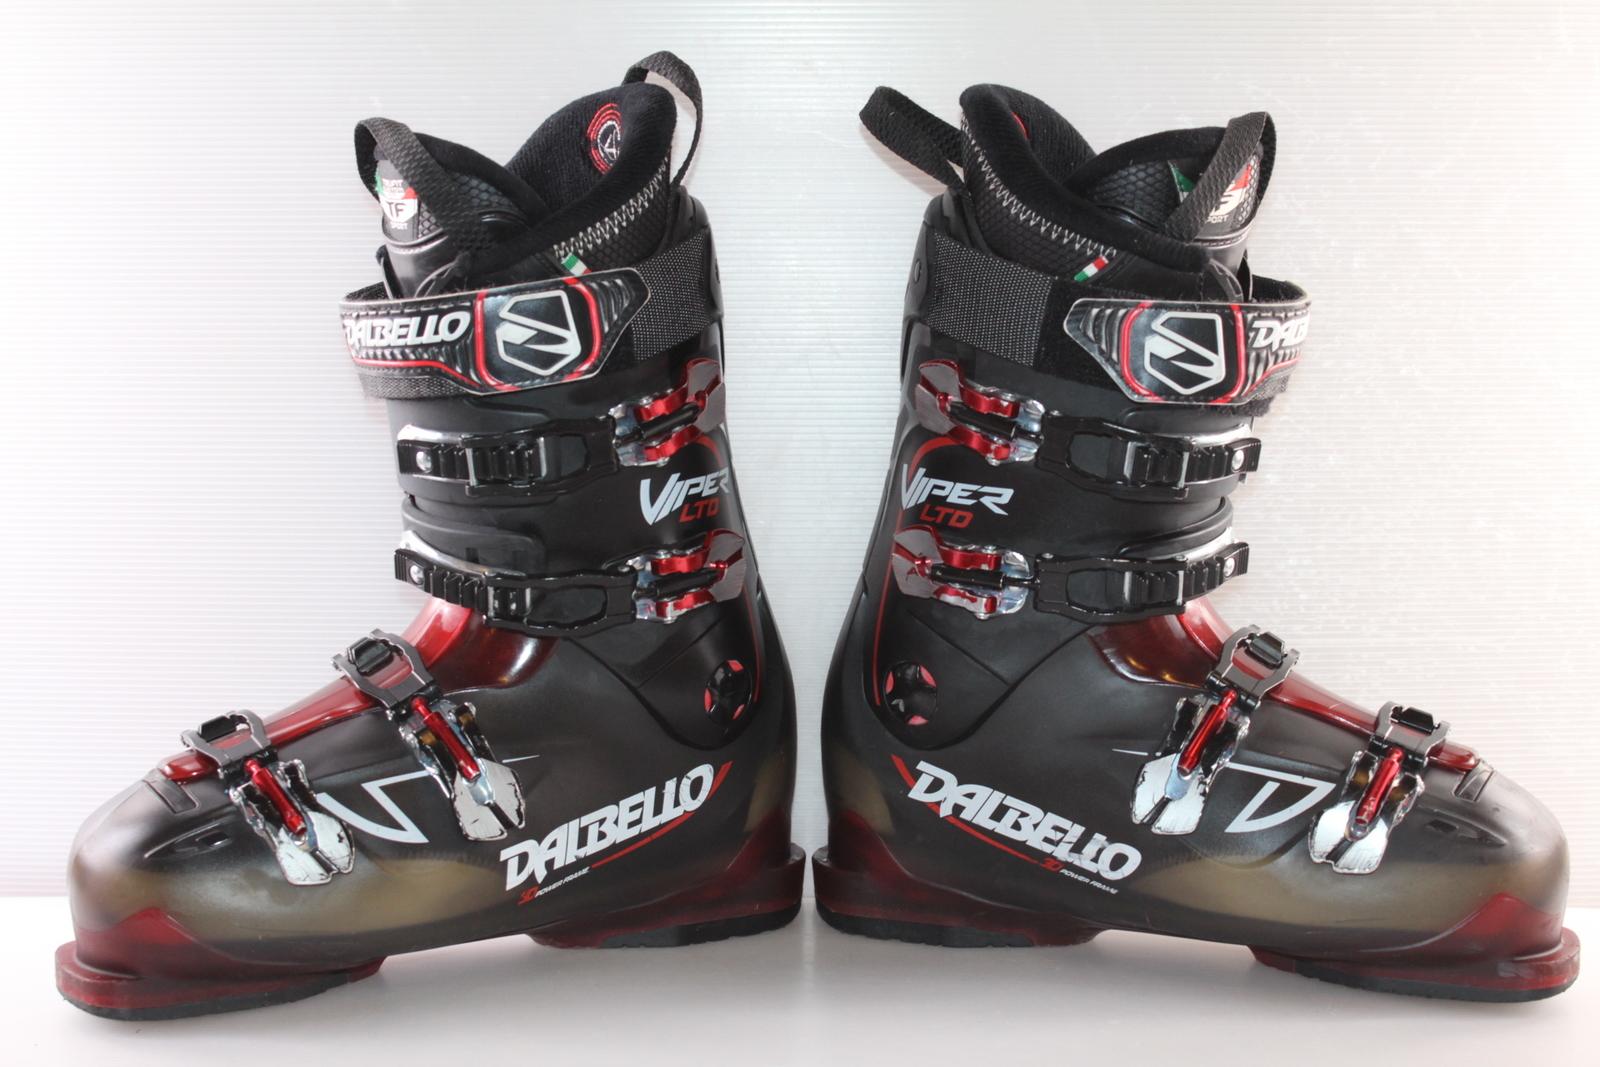 Lyžařské boty Dalbello Viper LTD vel. EU44.5